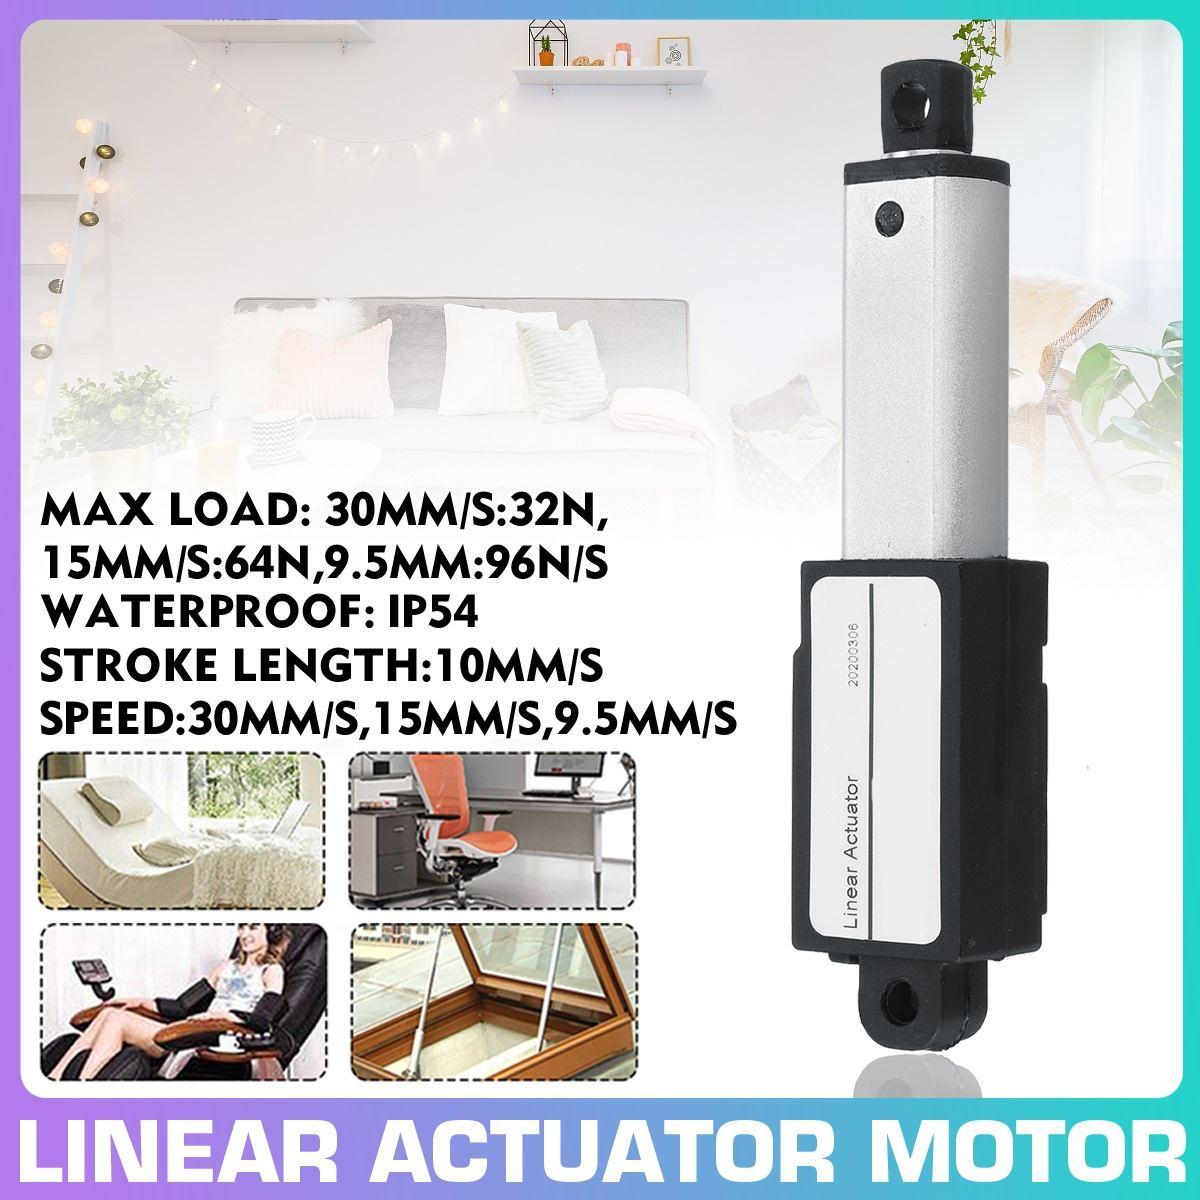 10mm aleación de aluminio de golpe activadores Micro lineales actuador lineal DC 12V eléctrico Mini Motor lineal 30 mm/s 15 mm/s 9,5mm